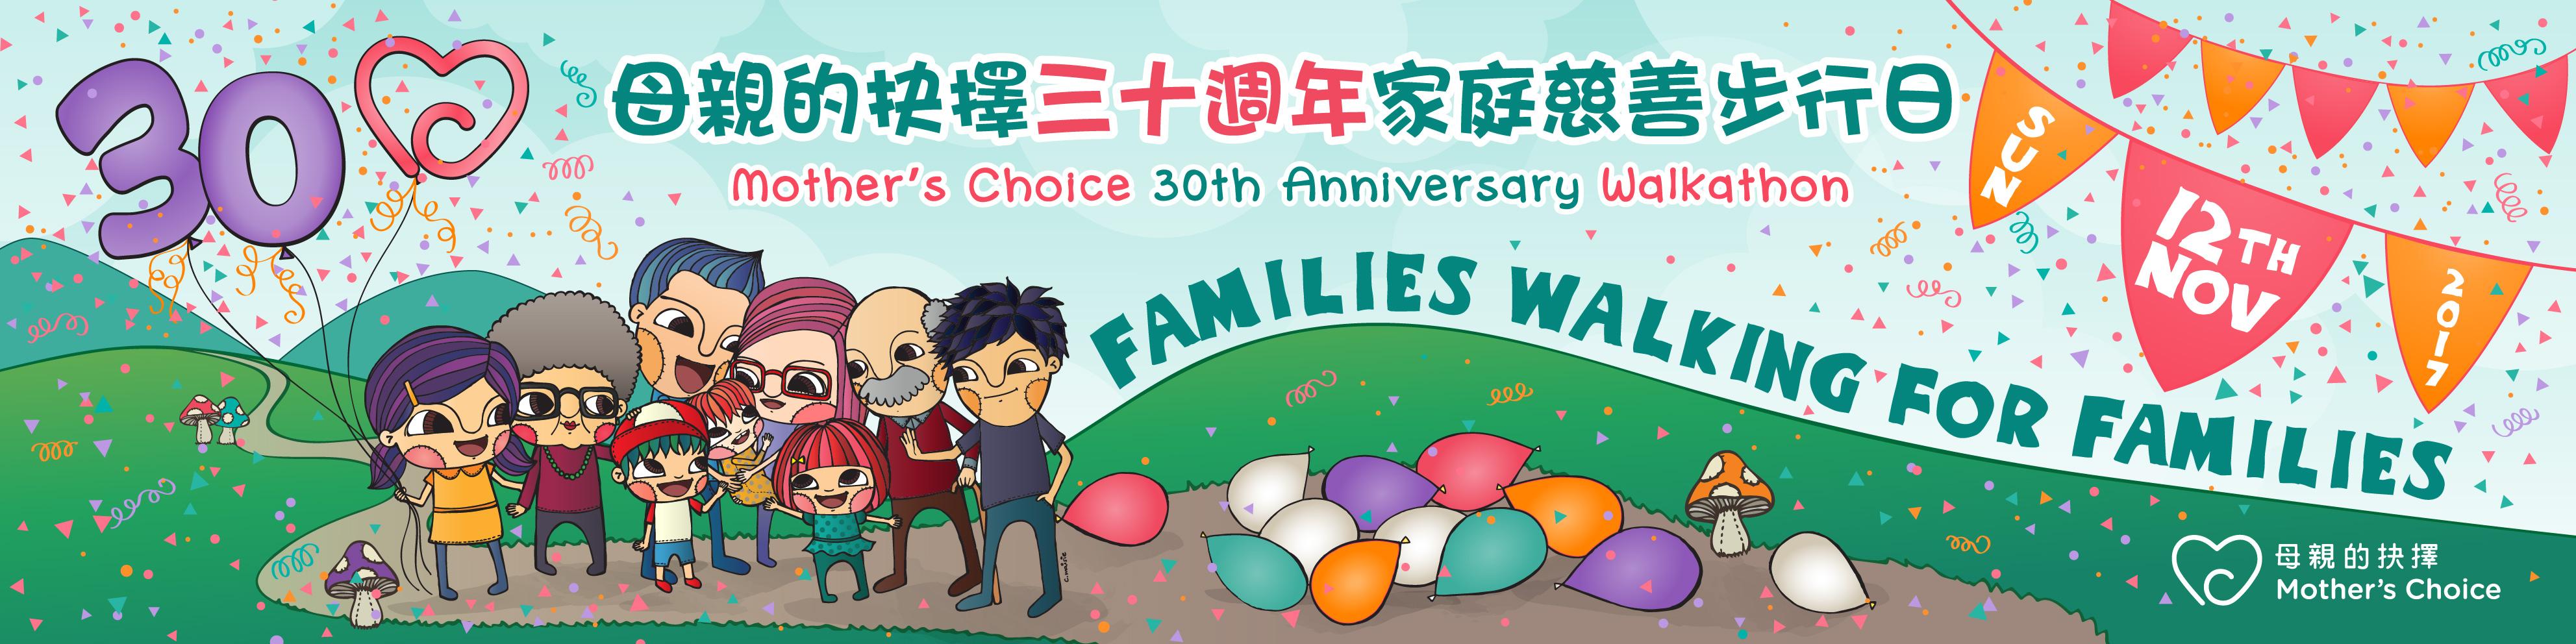 FringeBacker Fundraiser Mother's Choice 30th Anniversary Walkathon